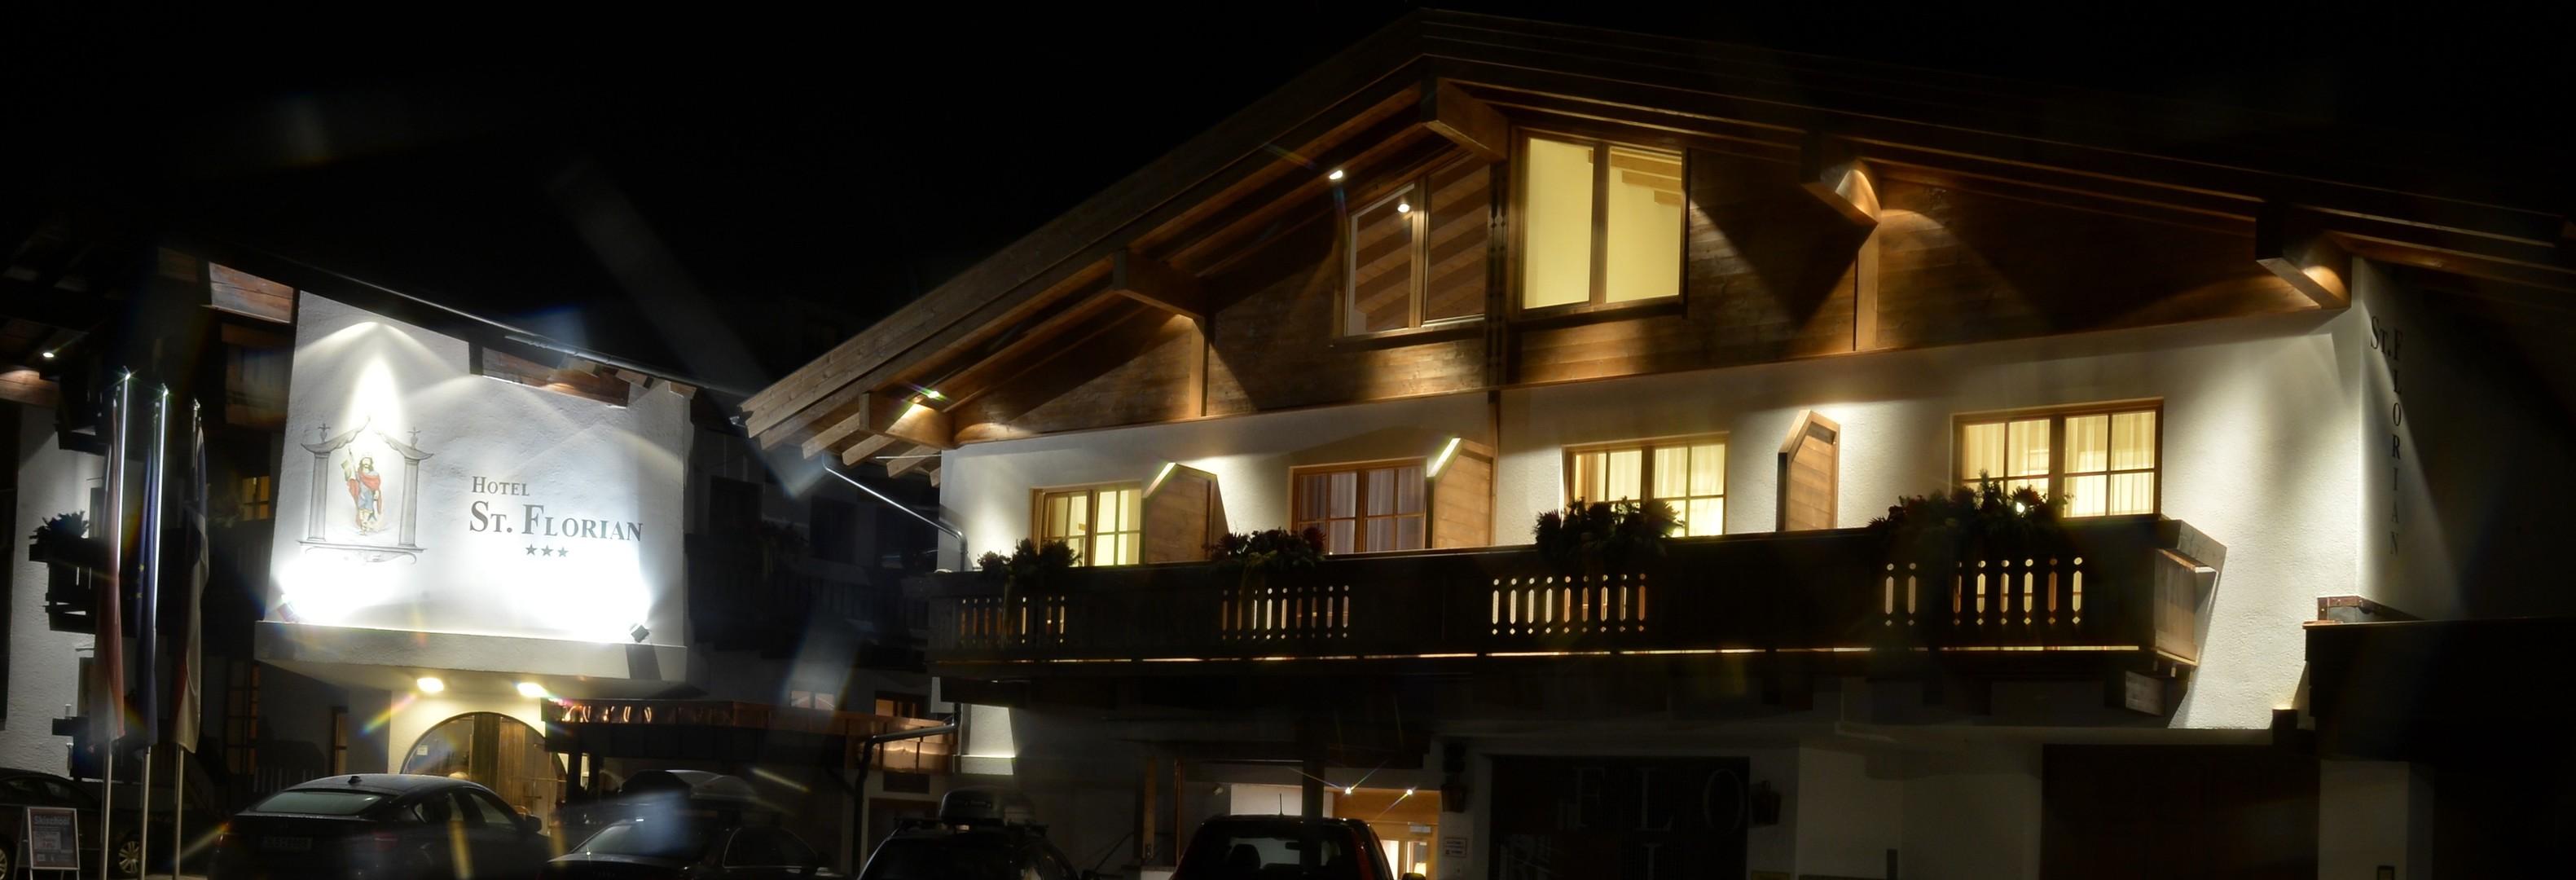 Hotel St. Florian #2